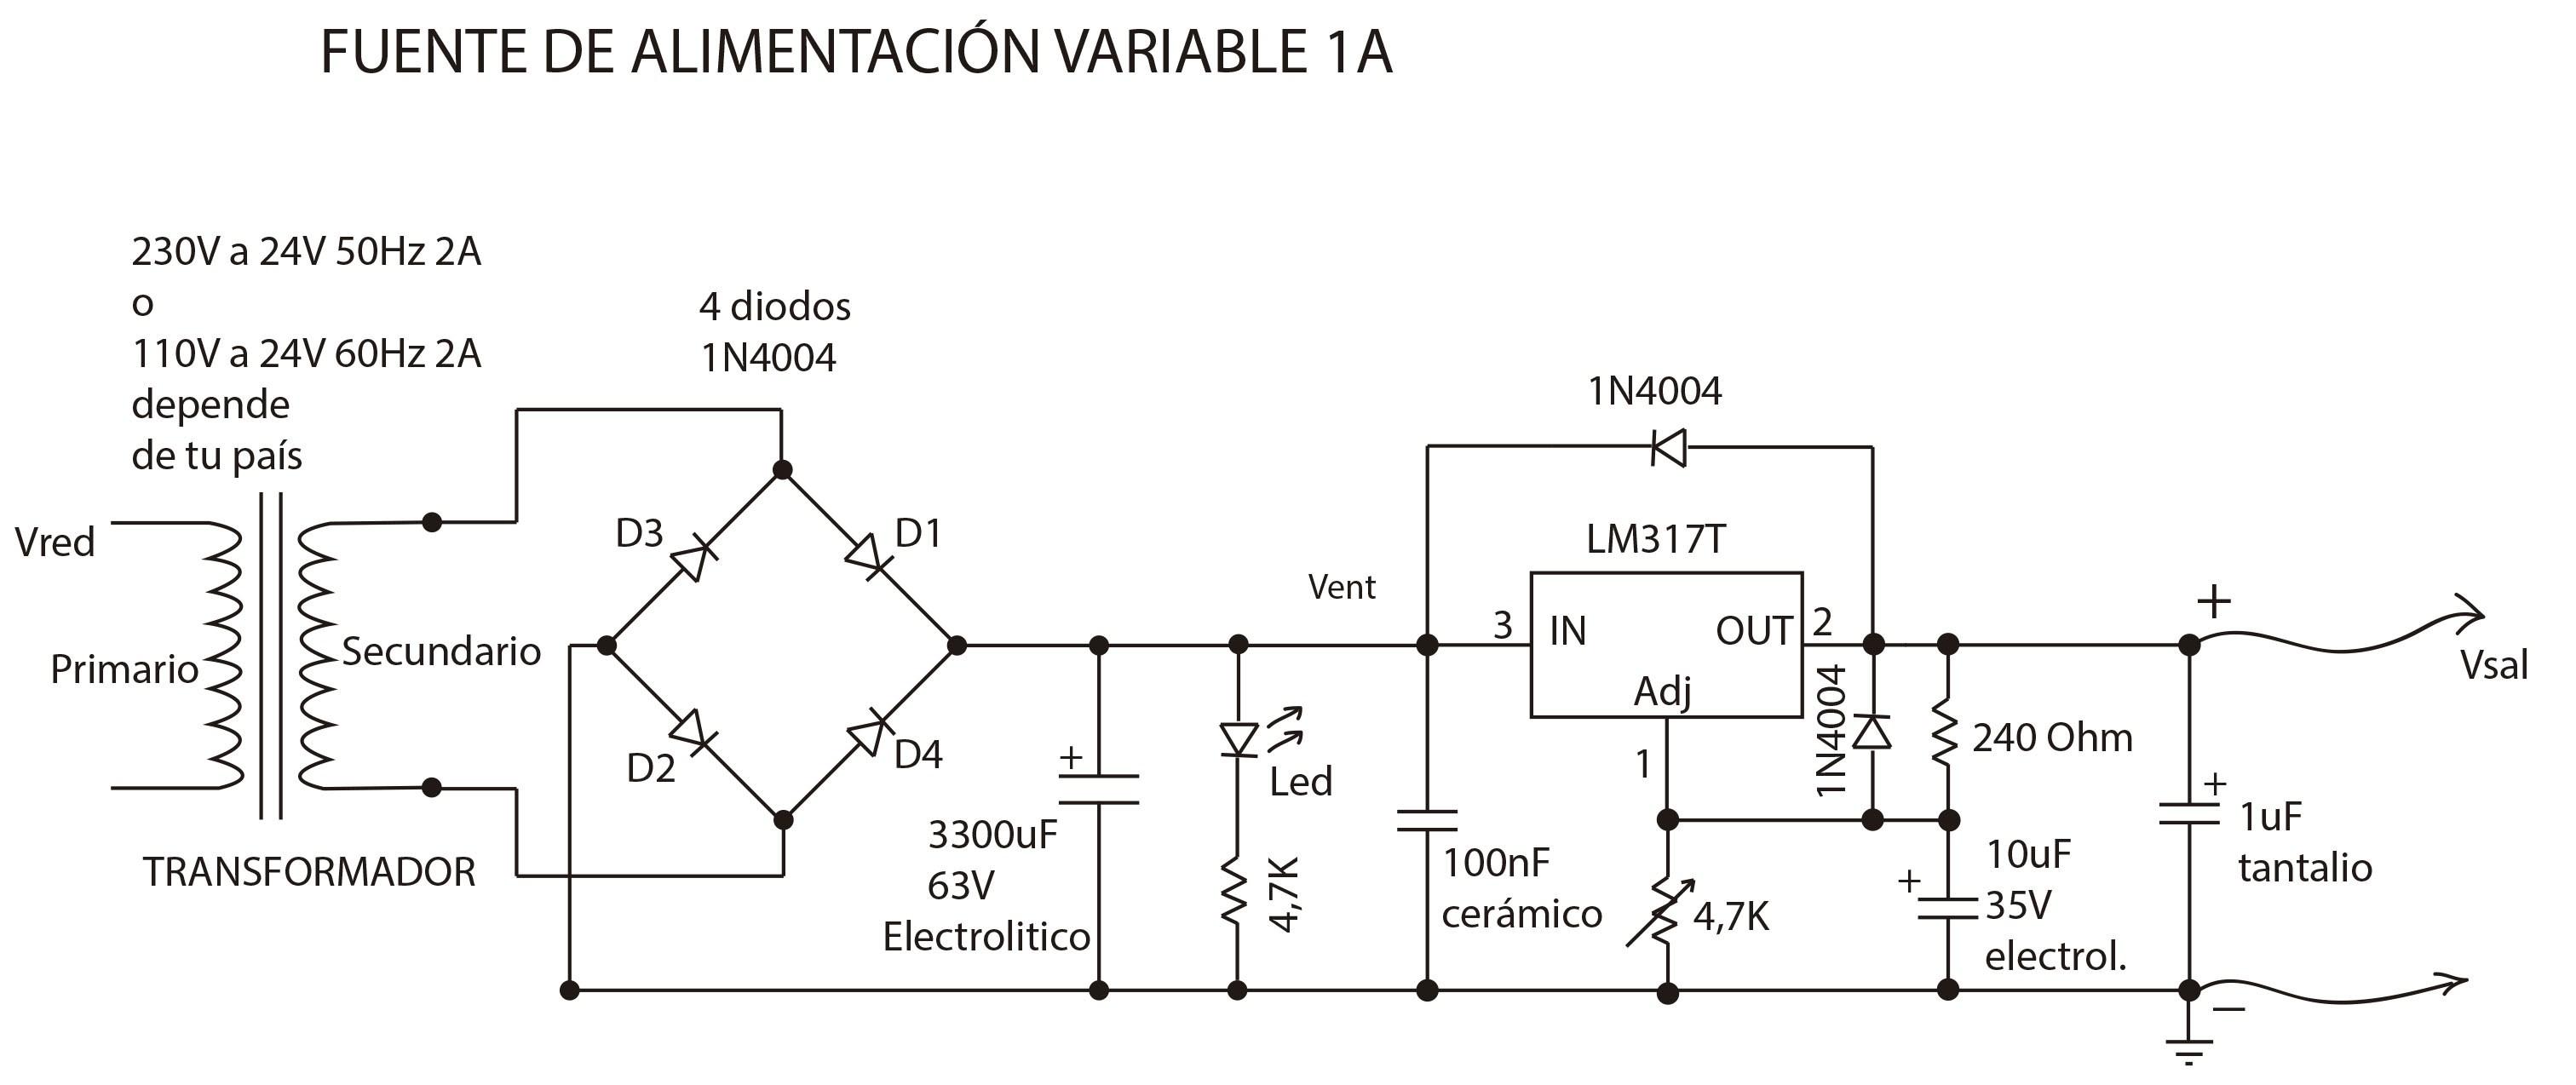 Circuito De Electronica : De que simulador es este circuito electrónico electrónica y